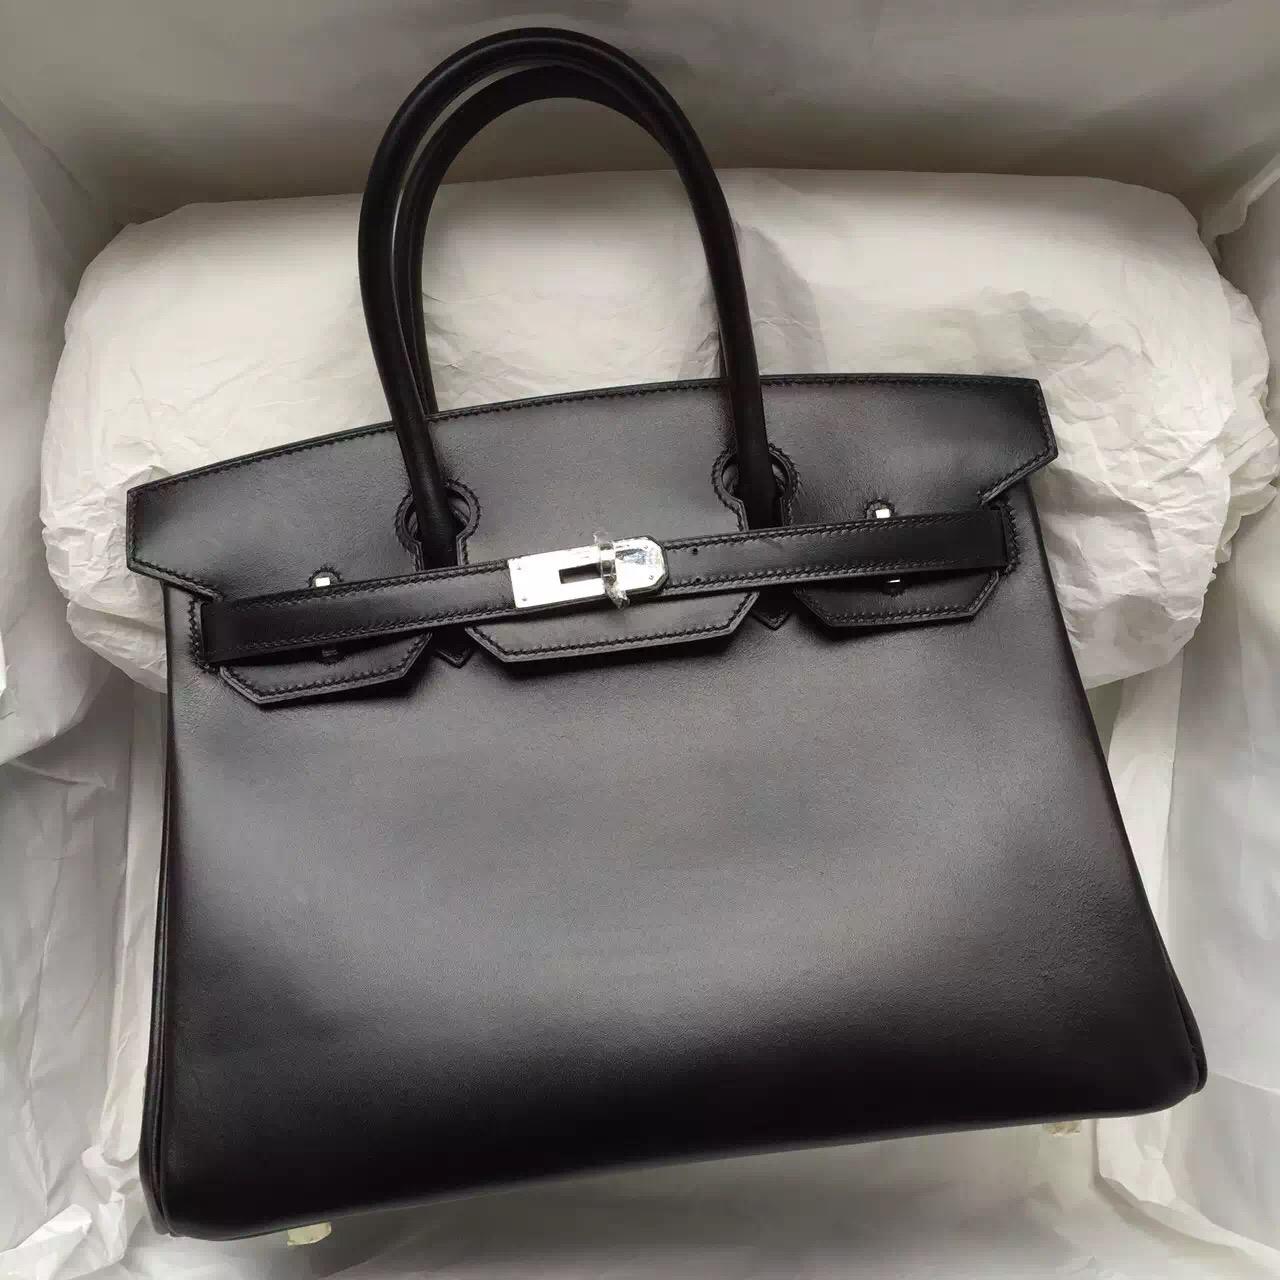 2015 New Hermes Birkin Bag 30CM in Black Box Leather Gold & Silver Hardware Tote Bag